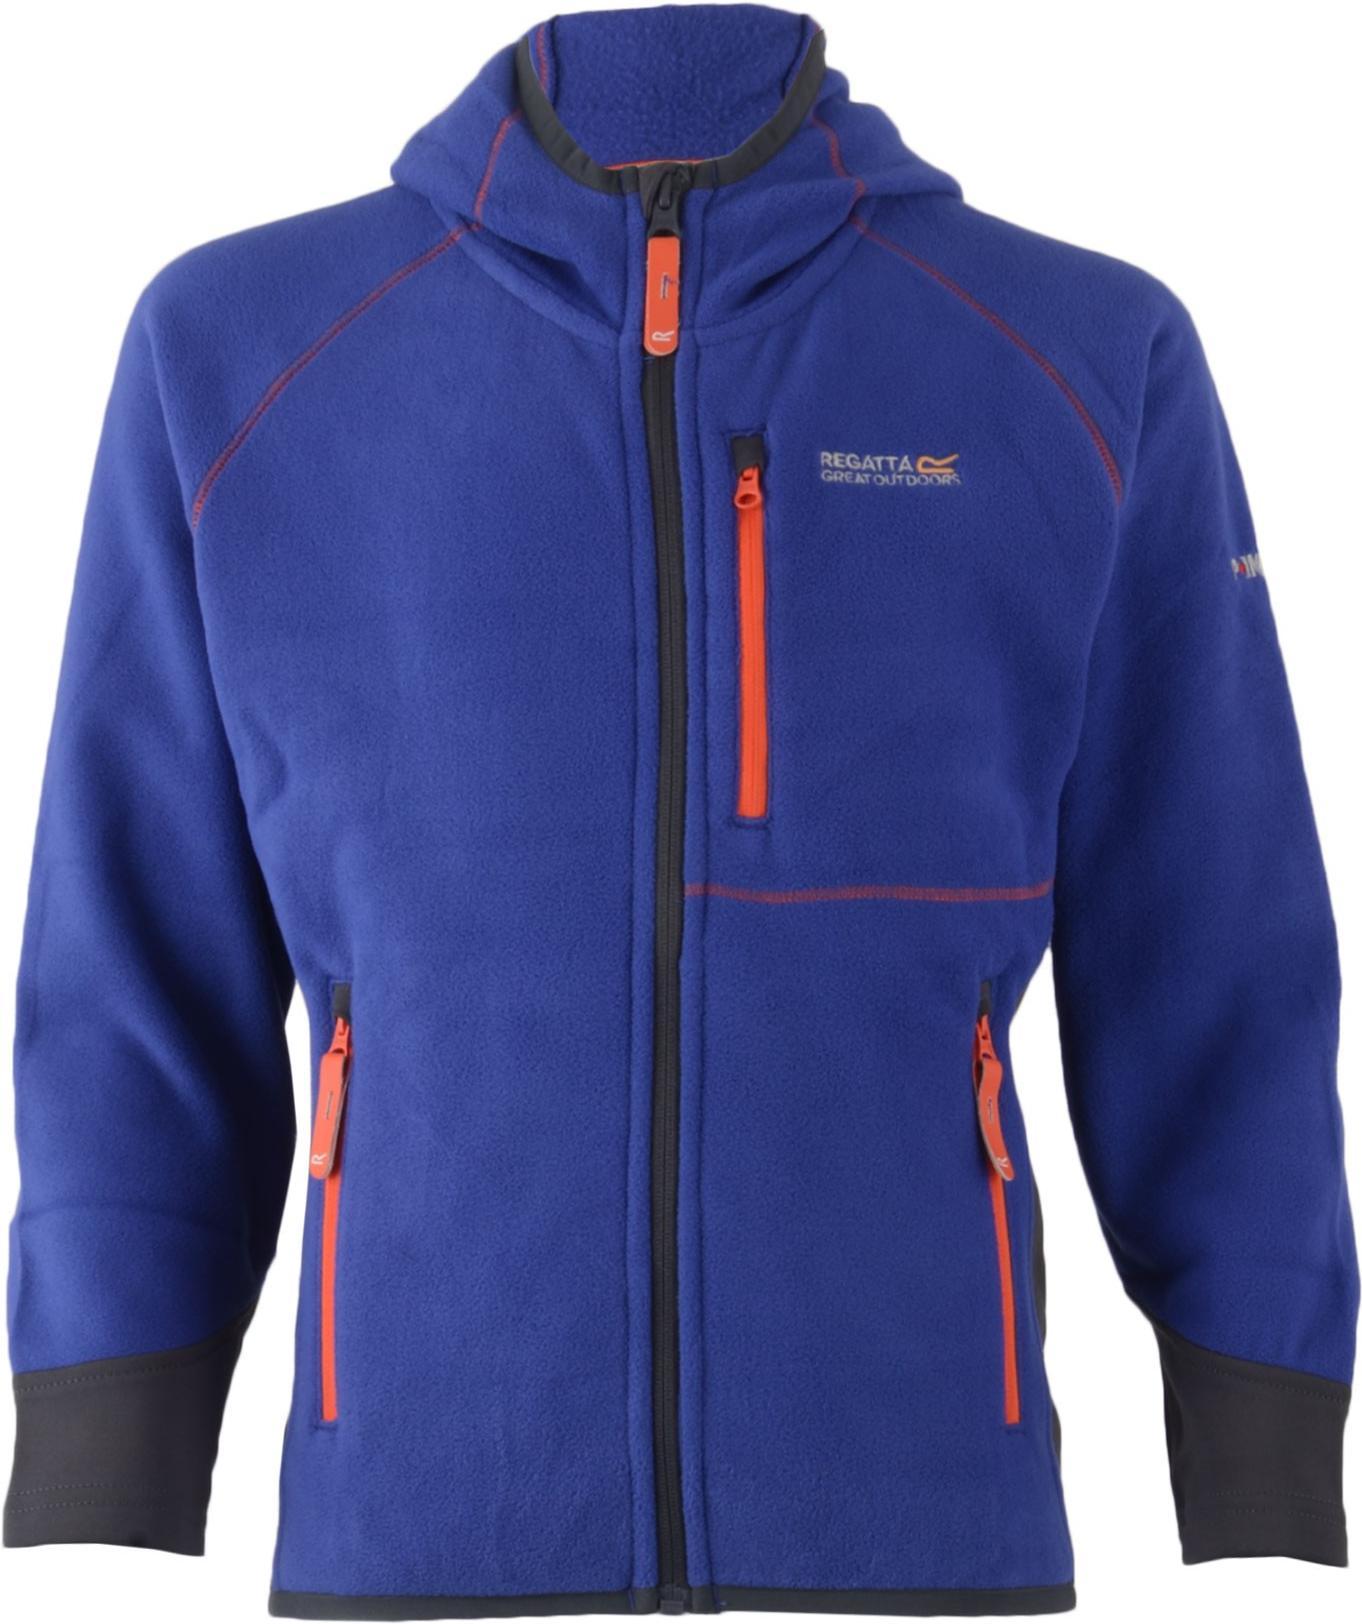 Regatta 刷毛外套/保暖刷毛衣/威飛 210彈性刷毛保暖連帽外套 Whinfell 童款 RKA164 19E 藍紫